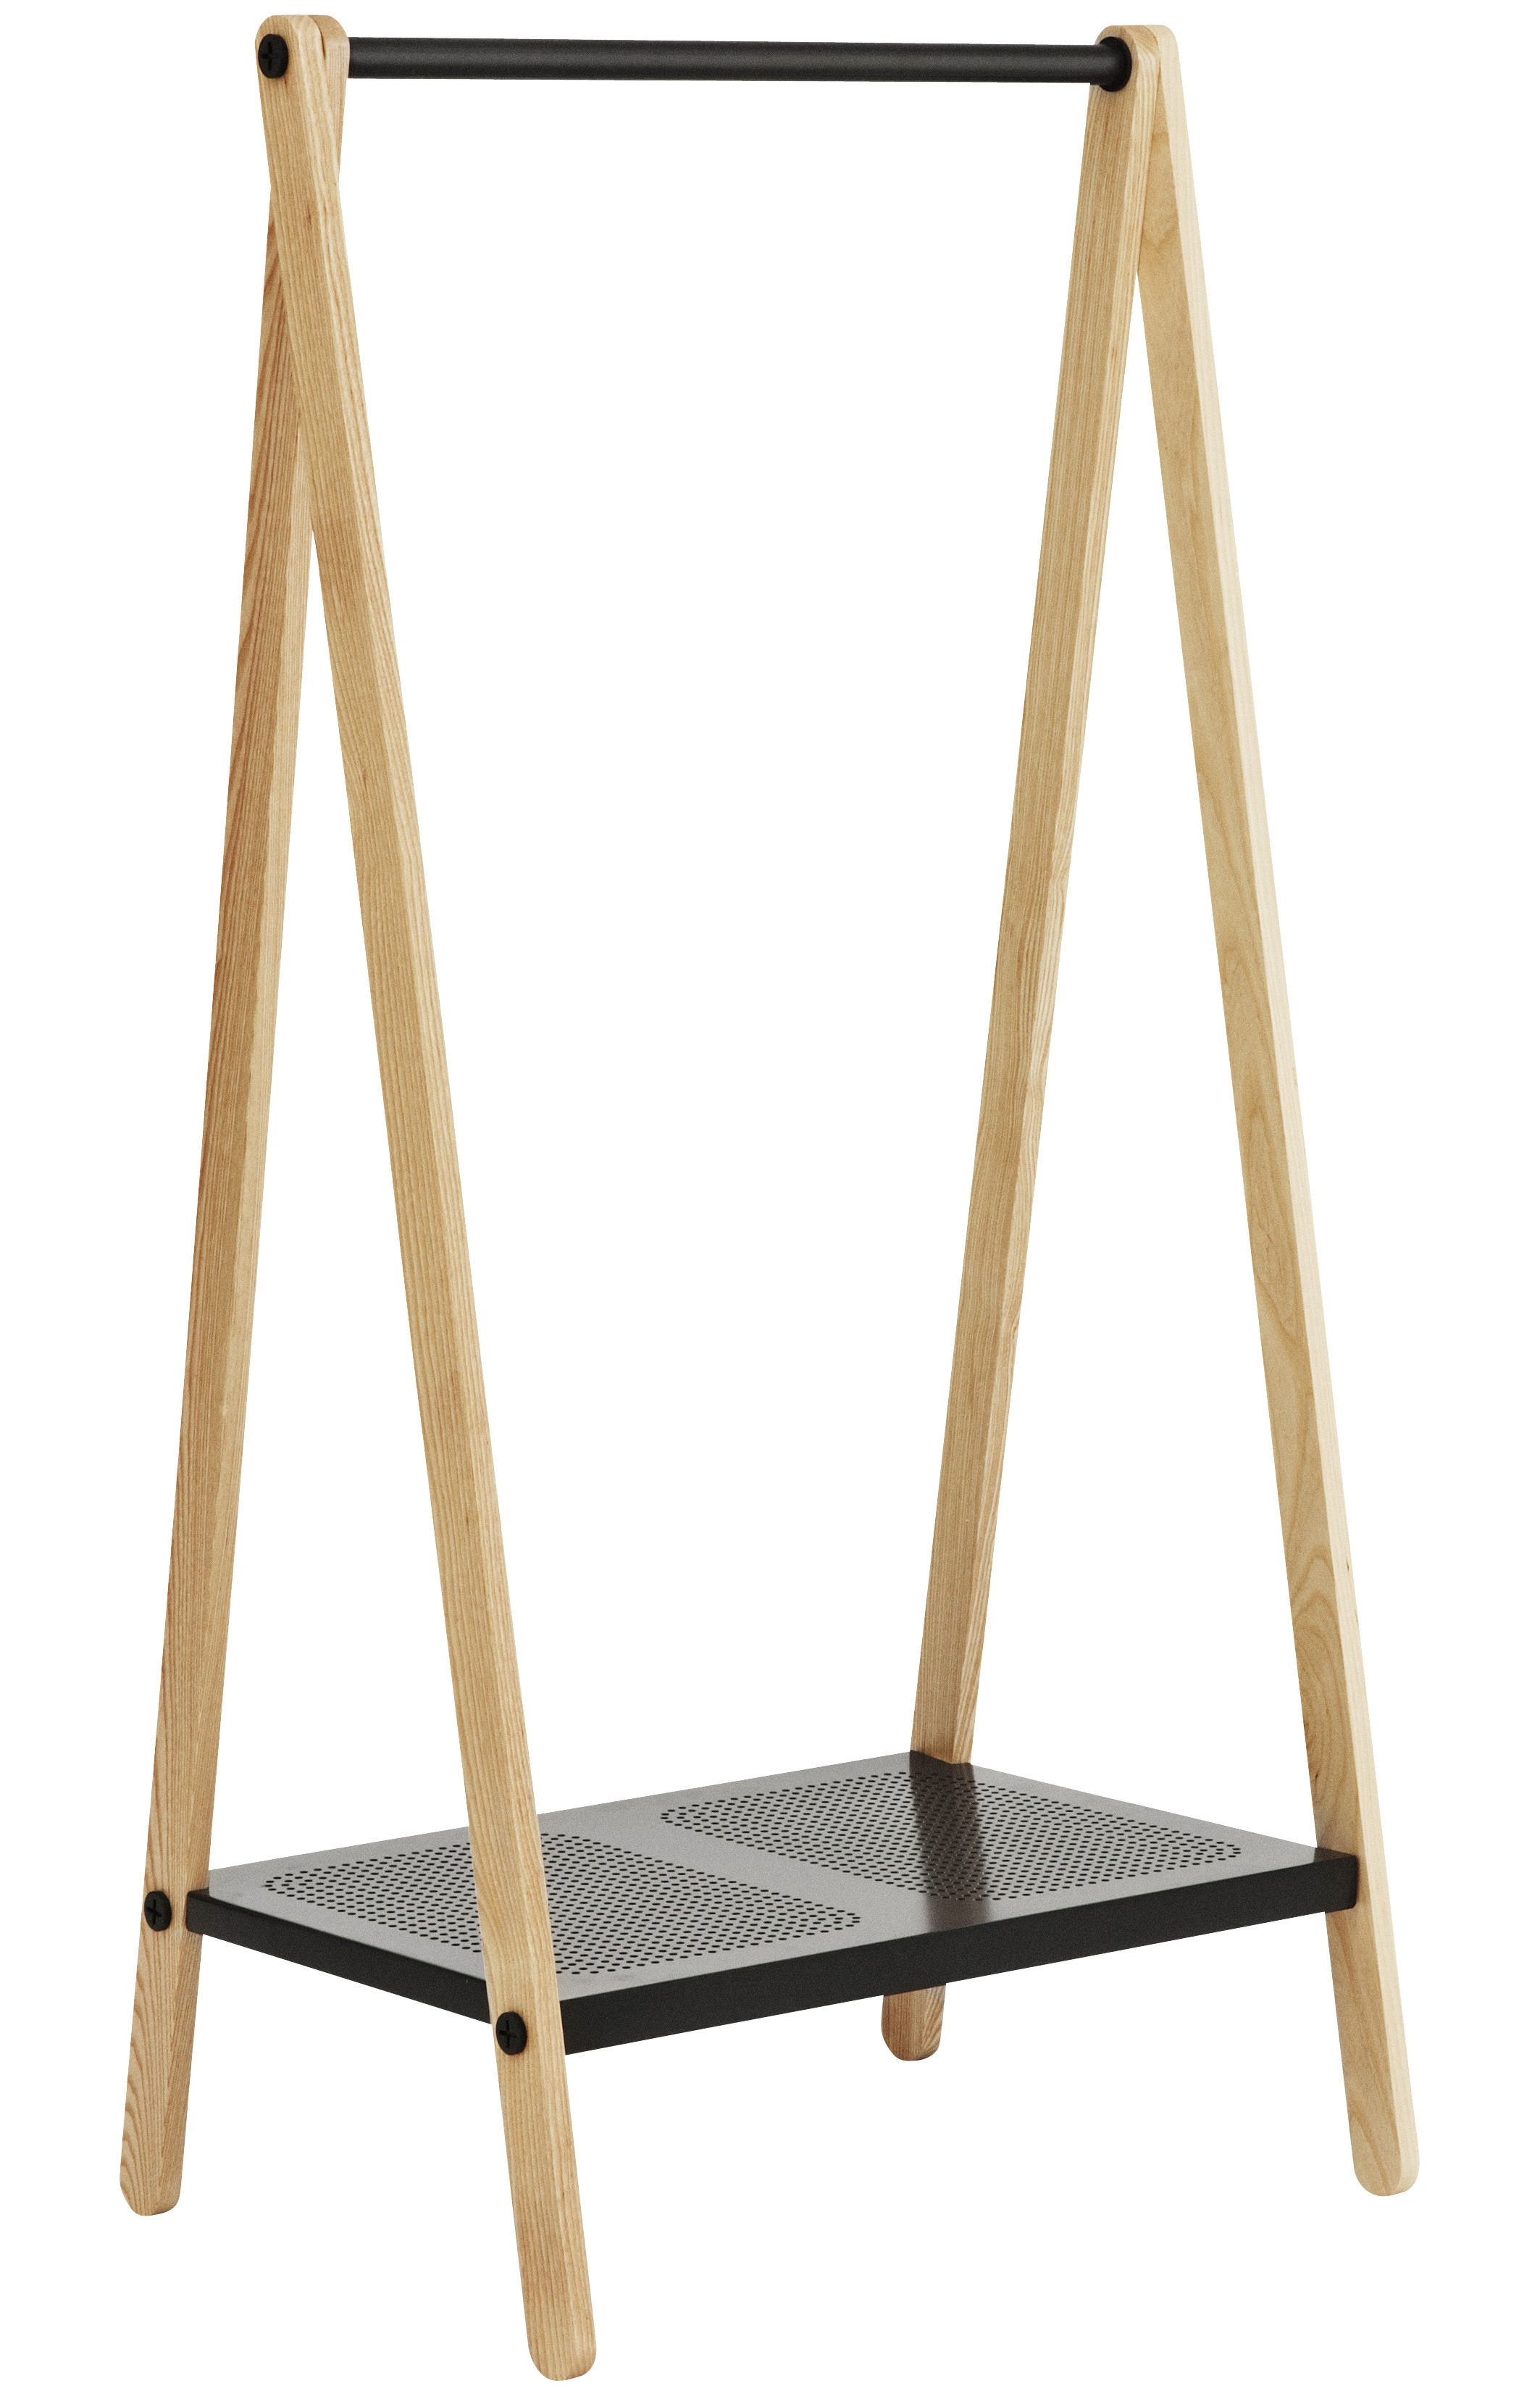 Furniture - Coat Racks & Pegs - Toj Rack - Small by Normann Copenhagen - W 74 cm - Grey - Ashwood, Metal